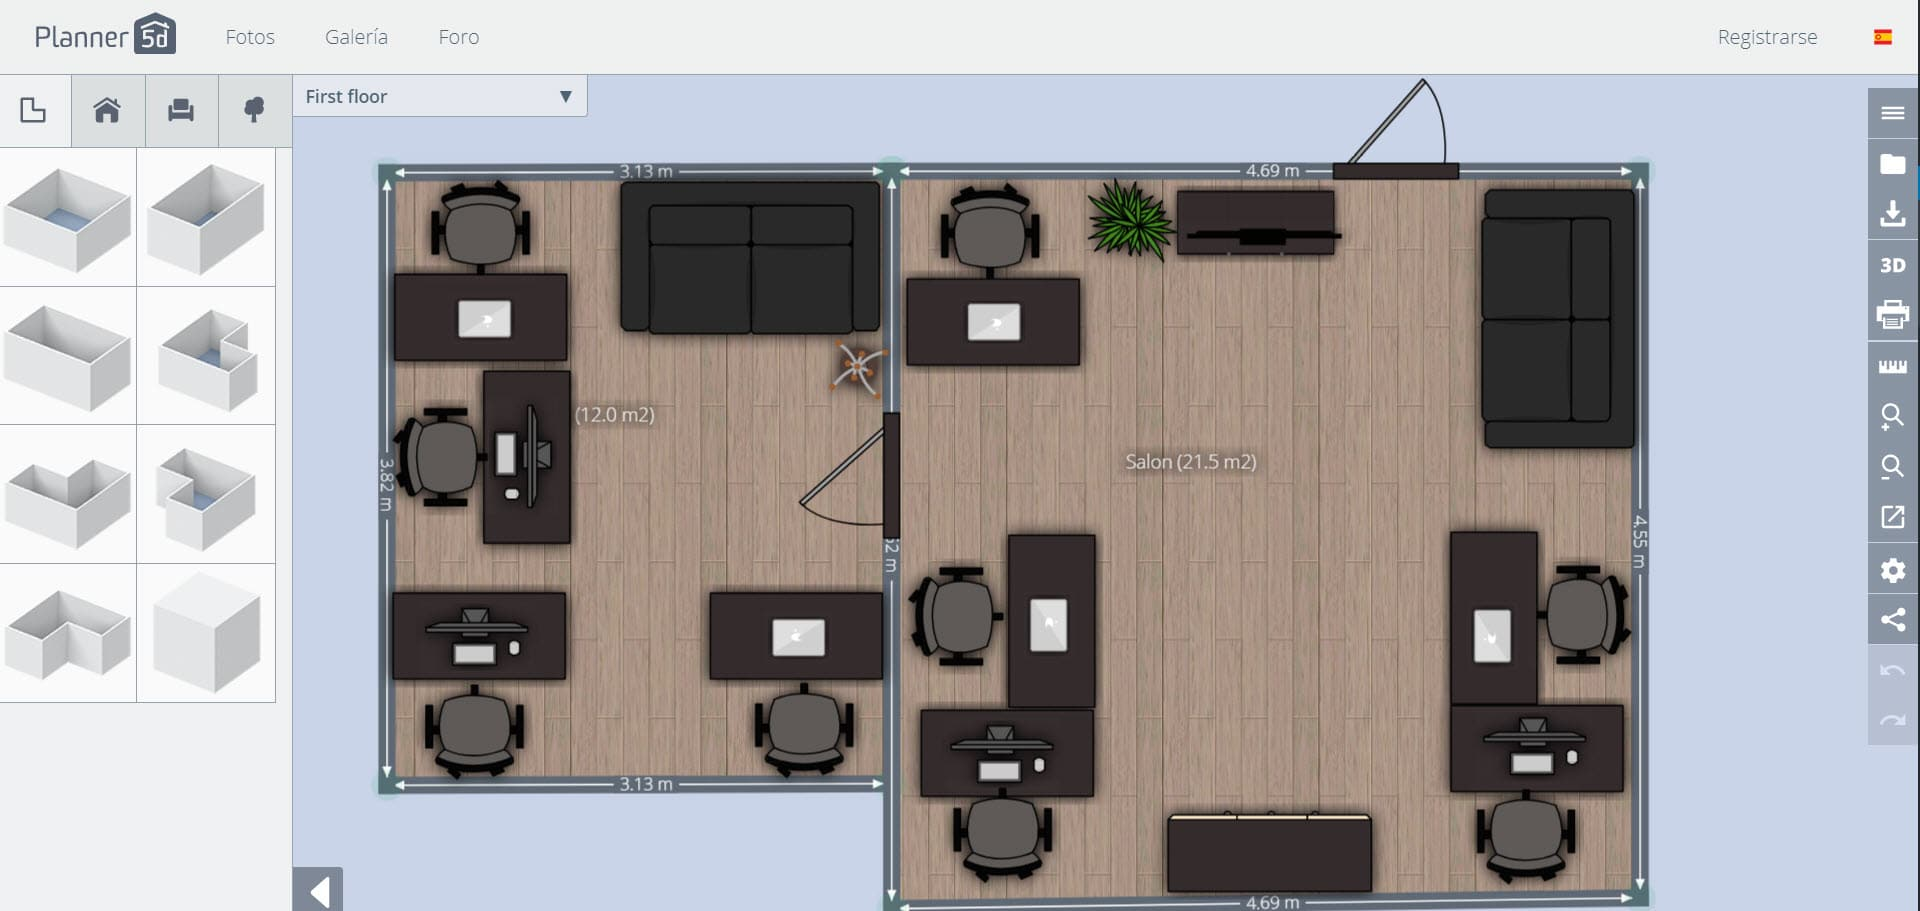 10 aplicaciones dise o de planos e interiores for Mejores apps de diseno de interiores